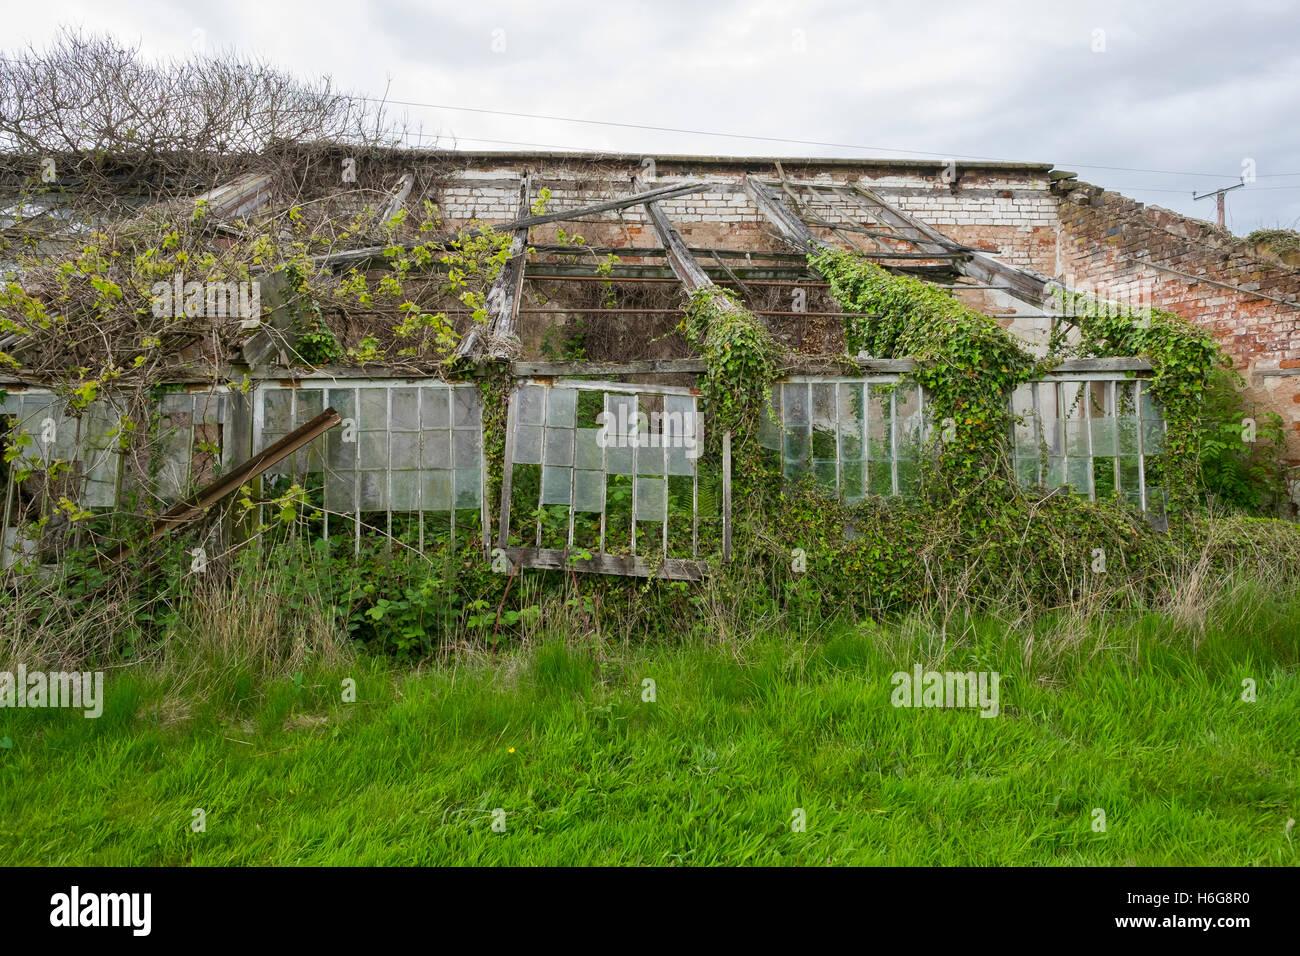 The greenhouse stanley - Derelict Greenhouse At Stanley Hall Bridgnorth Shropshire Uk